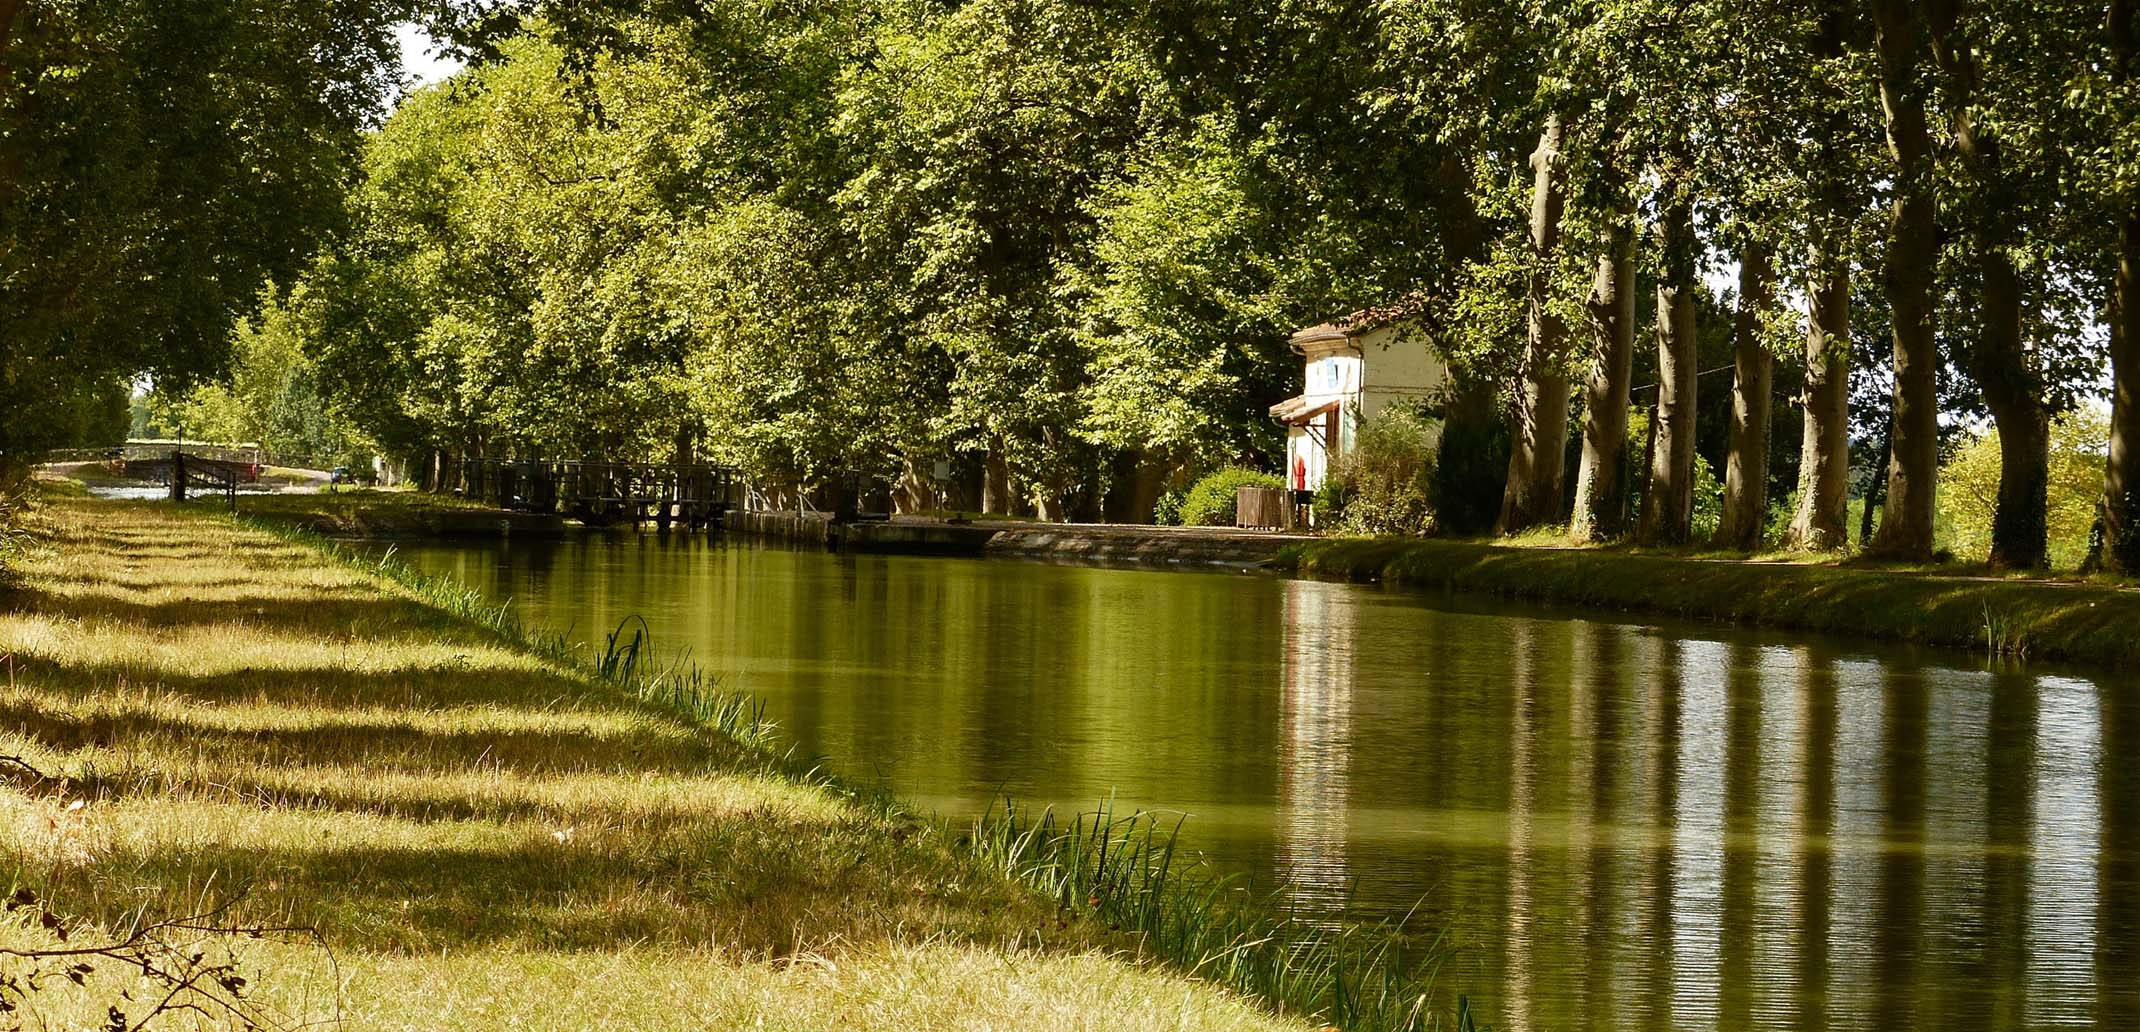 expert-comptable-a-toulouse-31-languedoc-roussillon-midi-pyrenees-visuel5